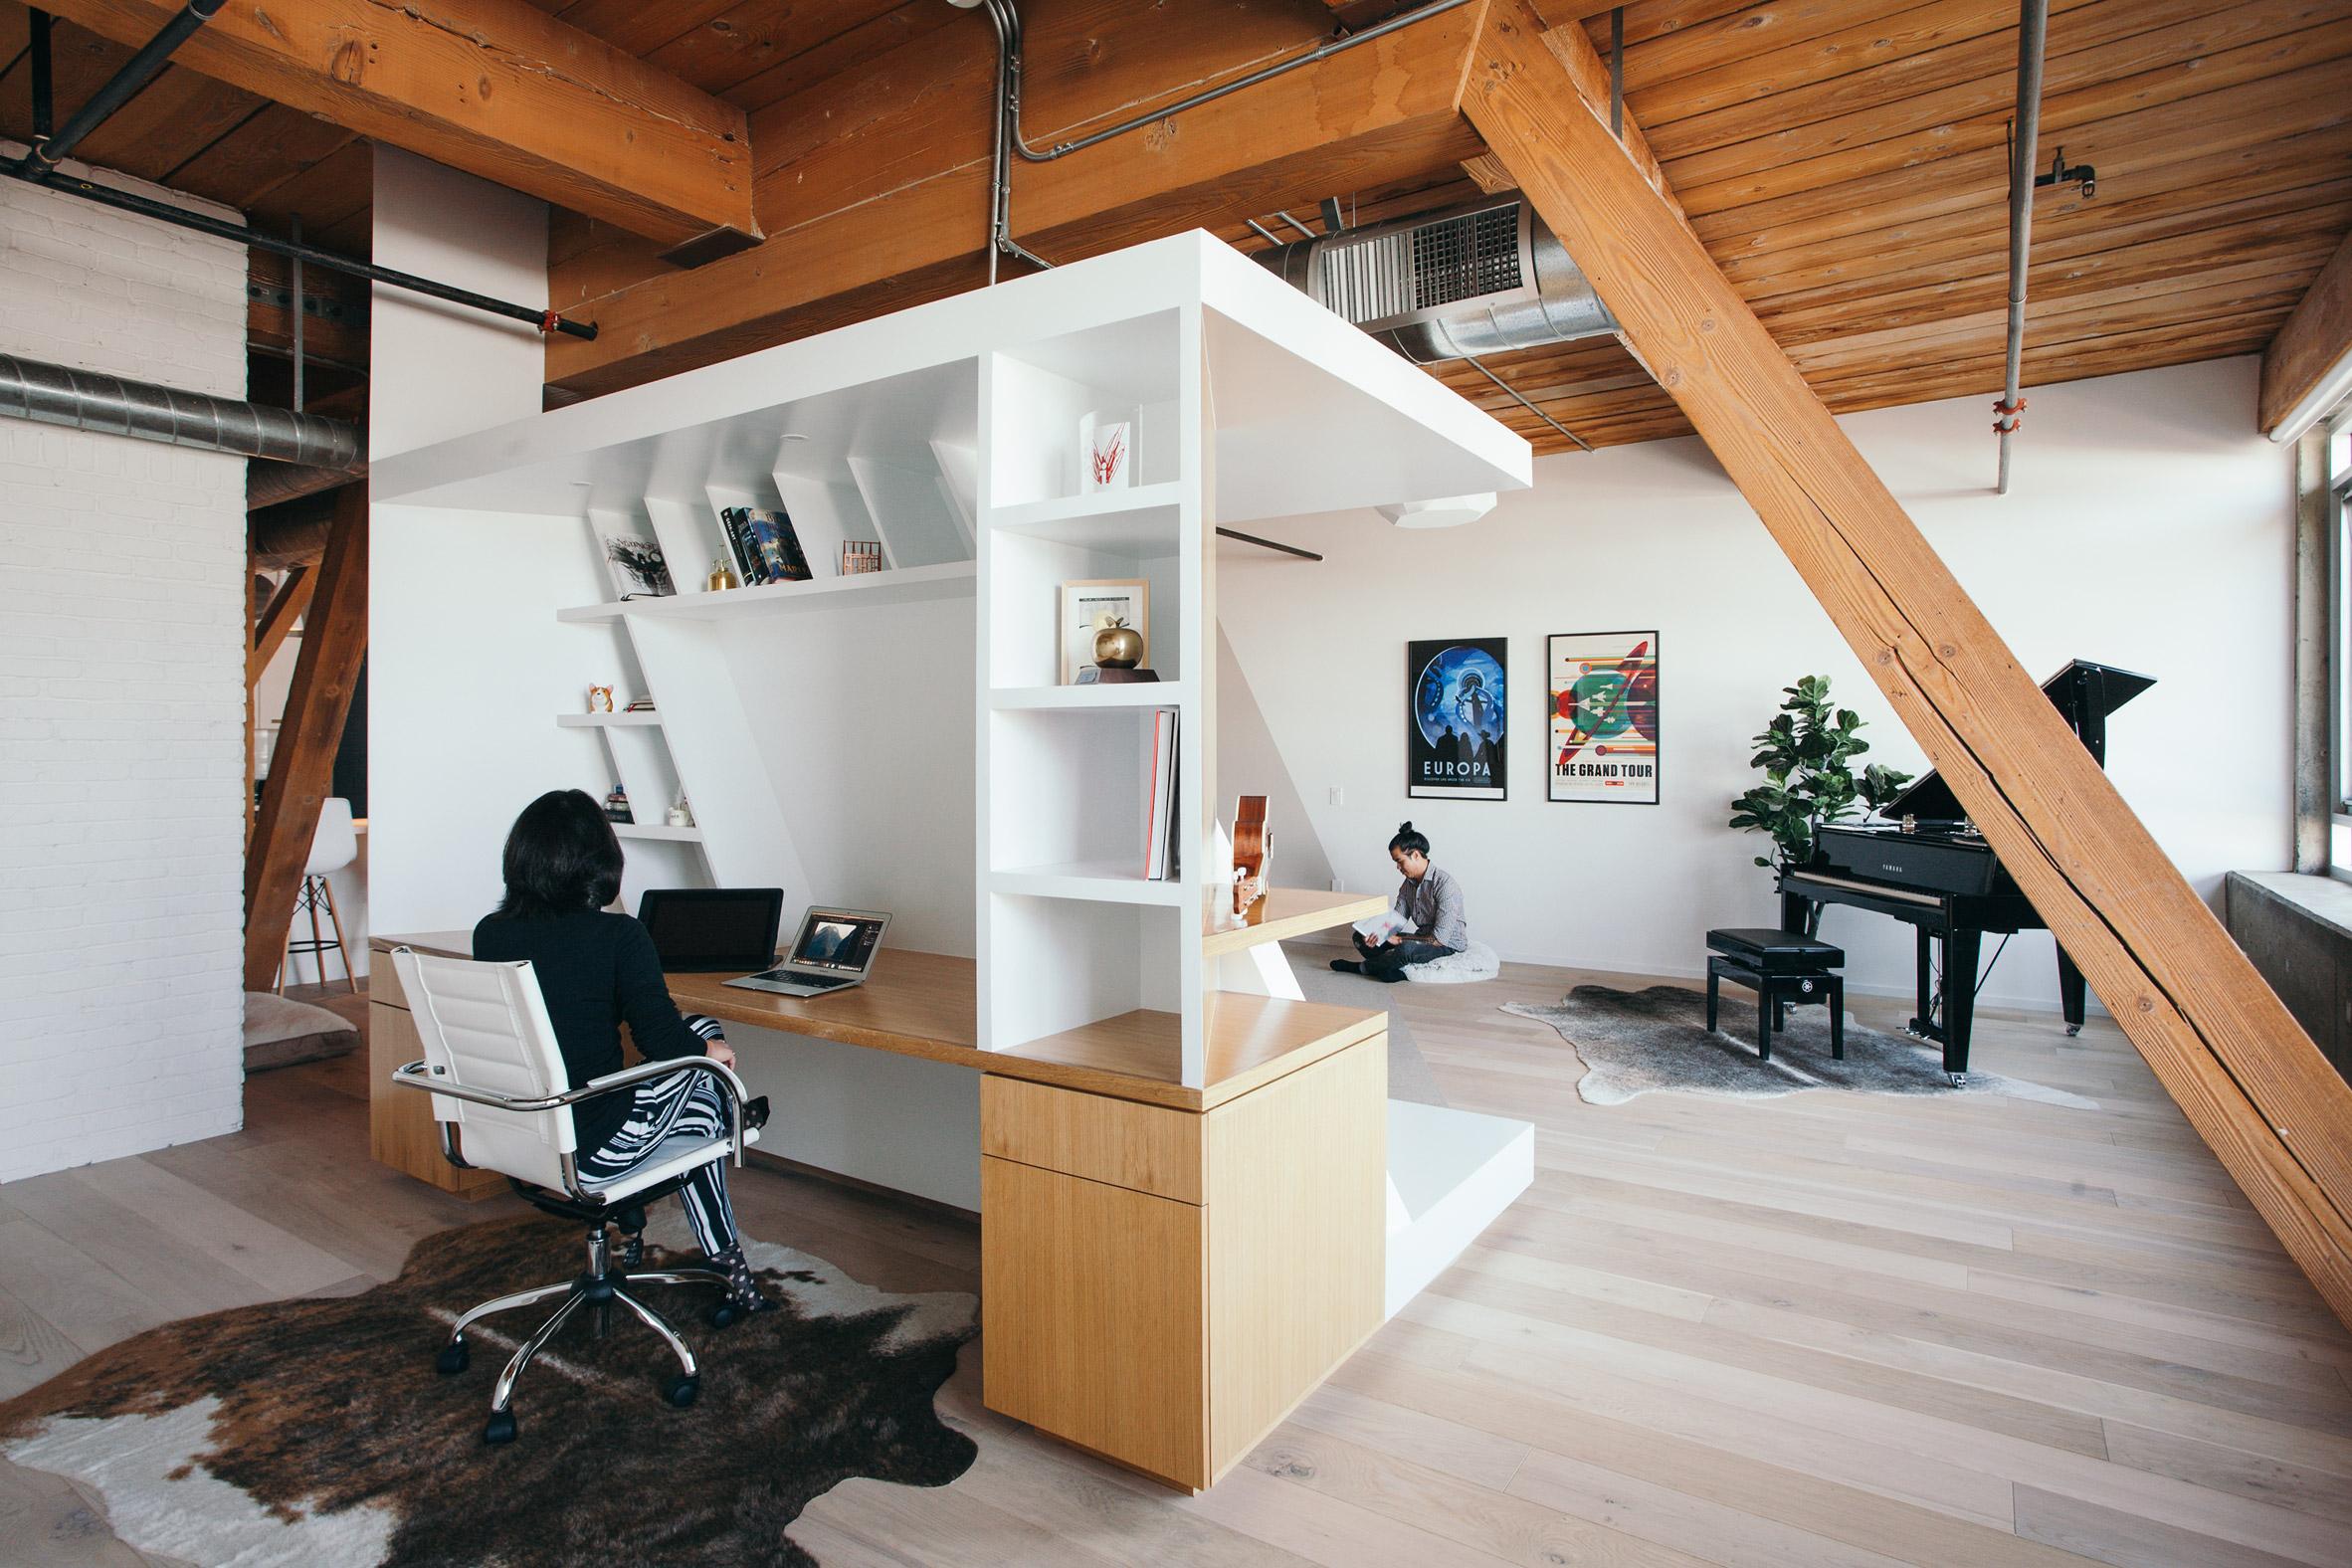 architecture-loft-interior-design-studia-osnovadesign-osnova-poltava_04